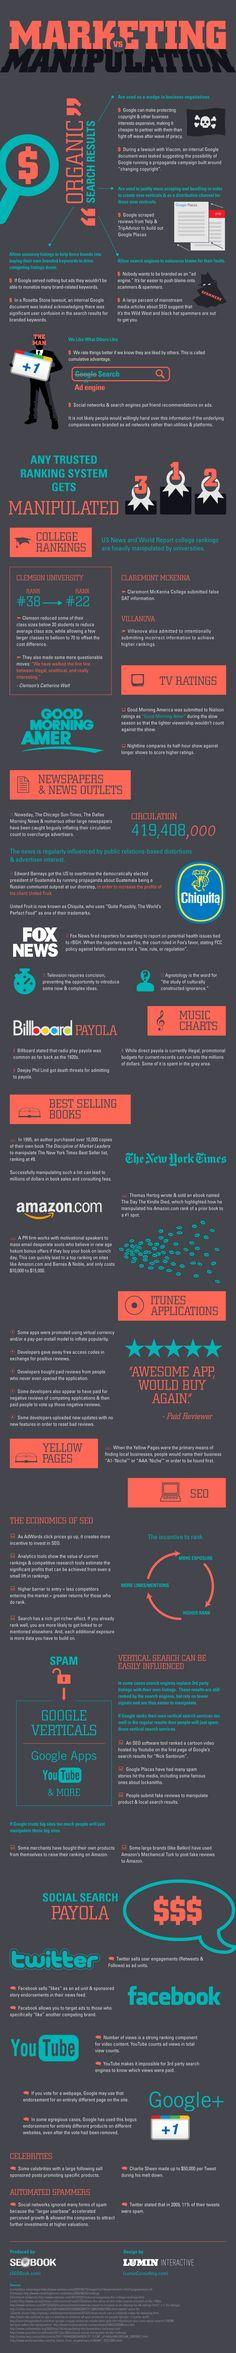 Marketing vs Manipulation